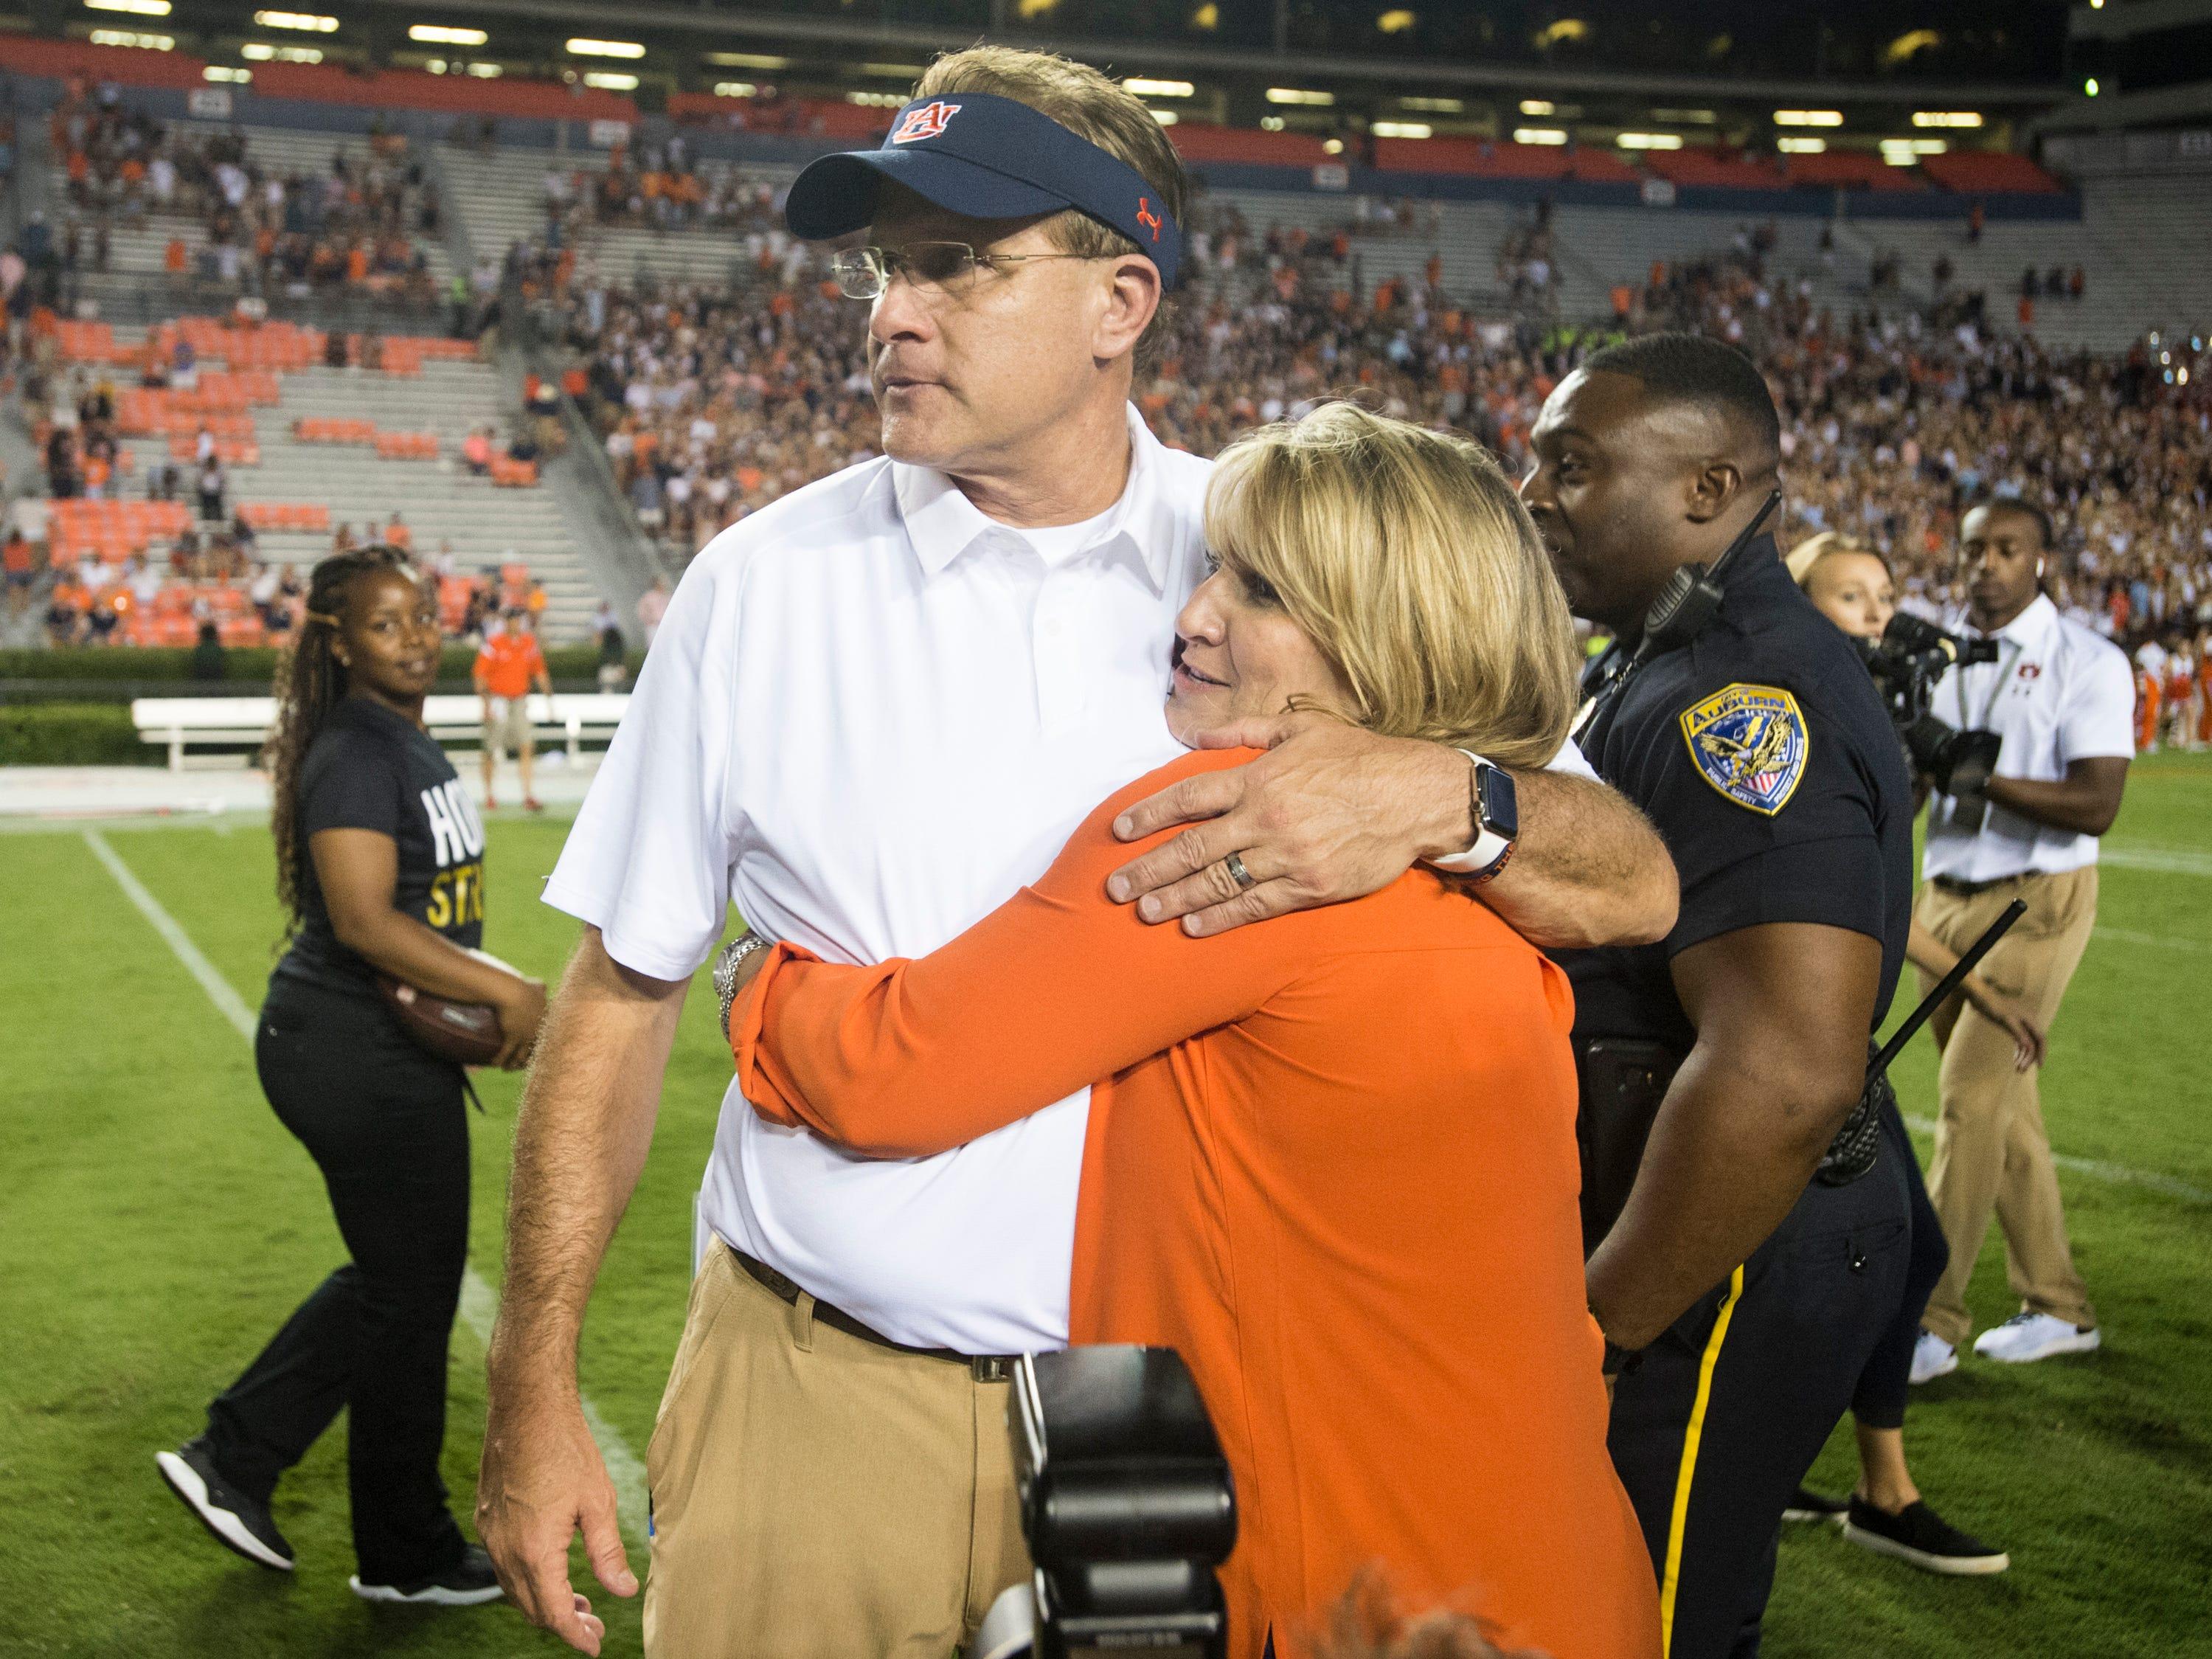 Auburn head coach Gus Malzahn hugs his wife, Kristi, after the game at Jordan-Hare Stadium in Auburn, Ala., on Saturday, Sept. 8, 2018. Auburn defeated Alabama State 63-9.